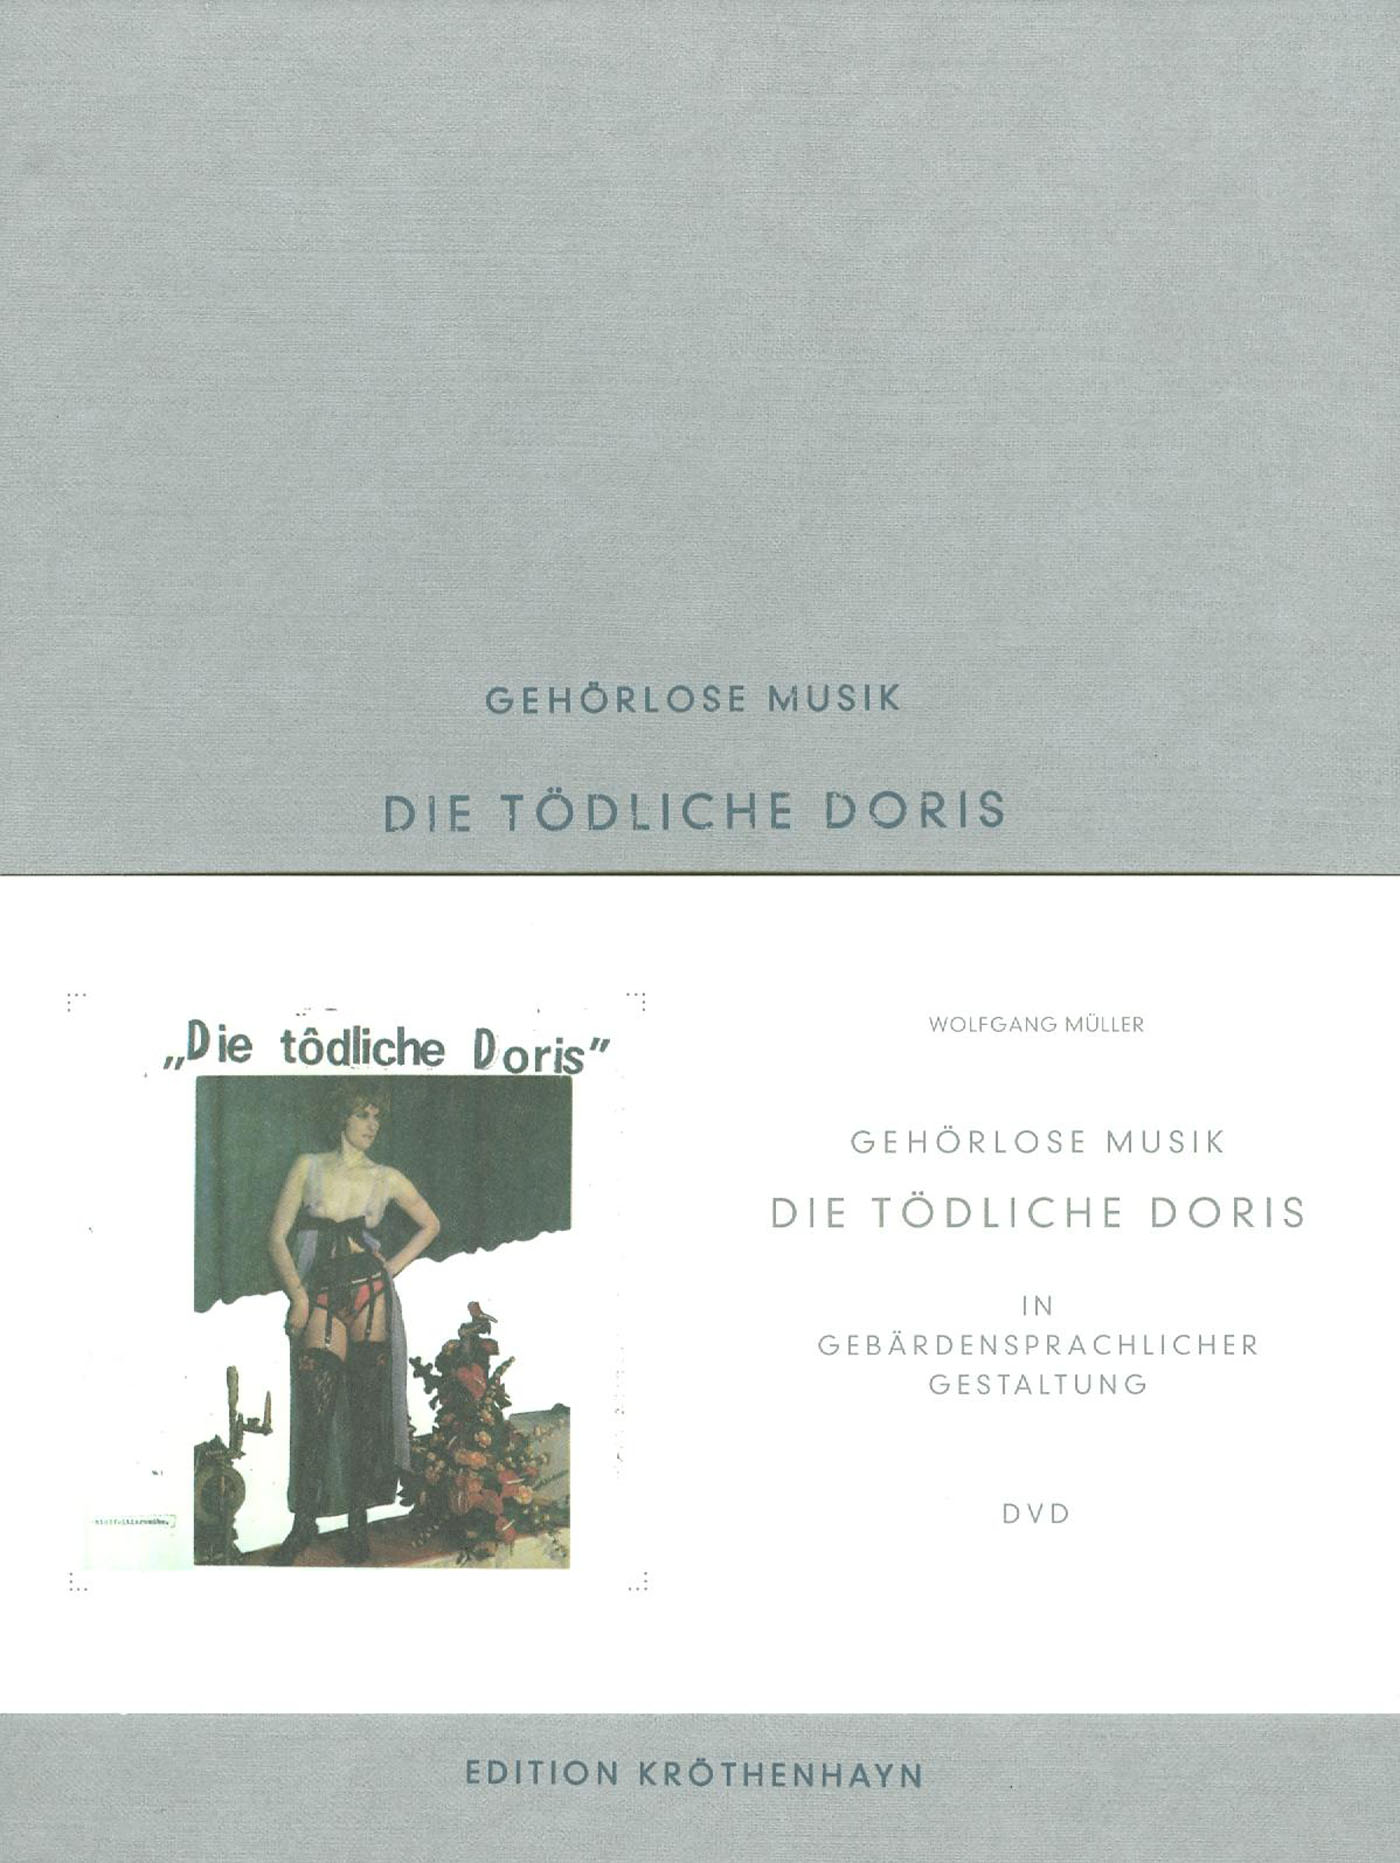 Die Todliche Doris: Gehorlose Musik